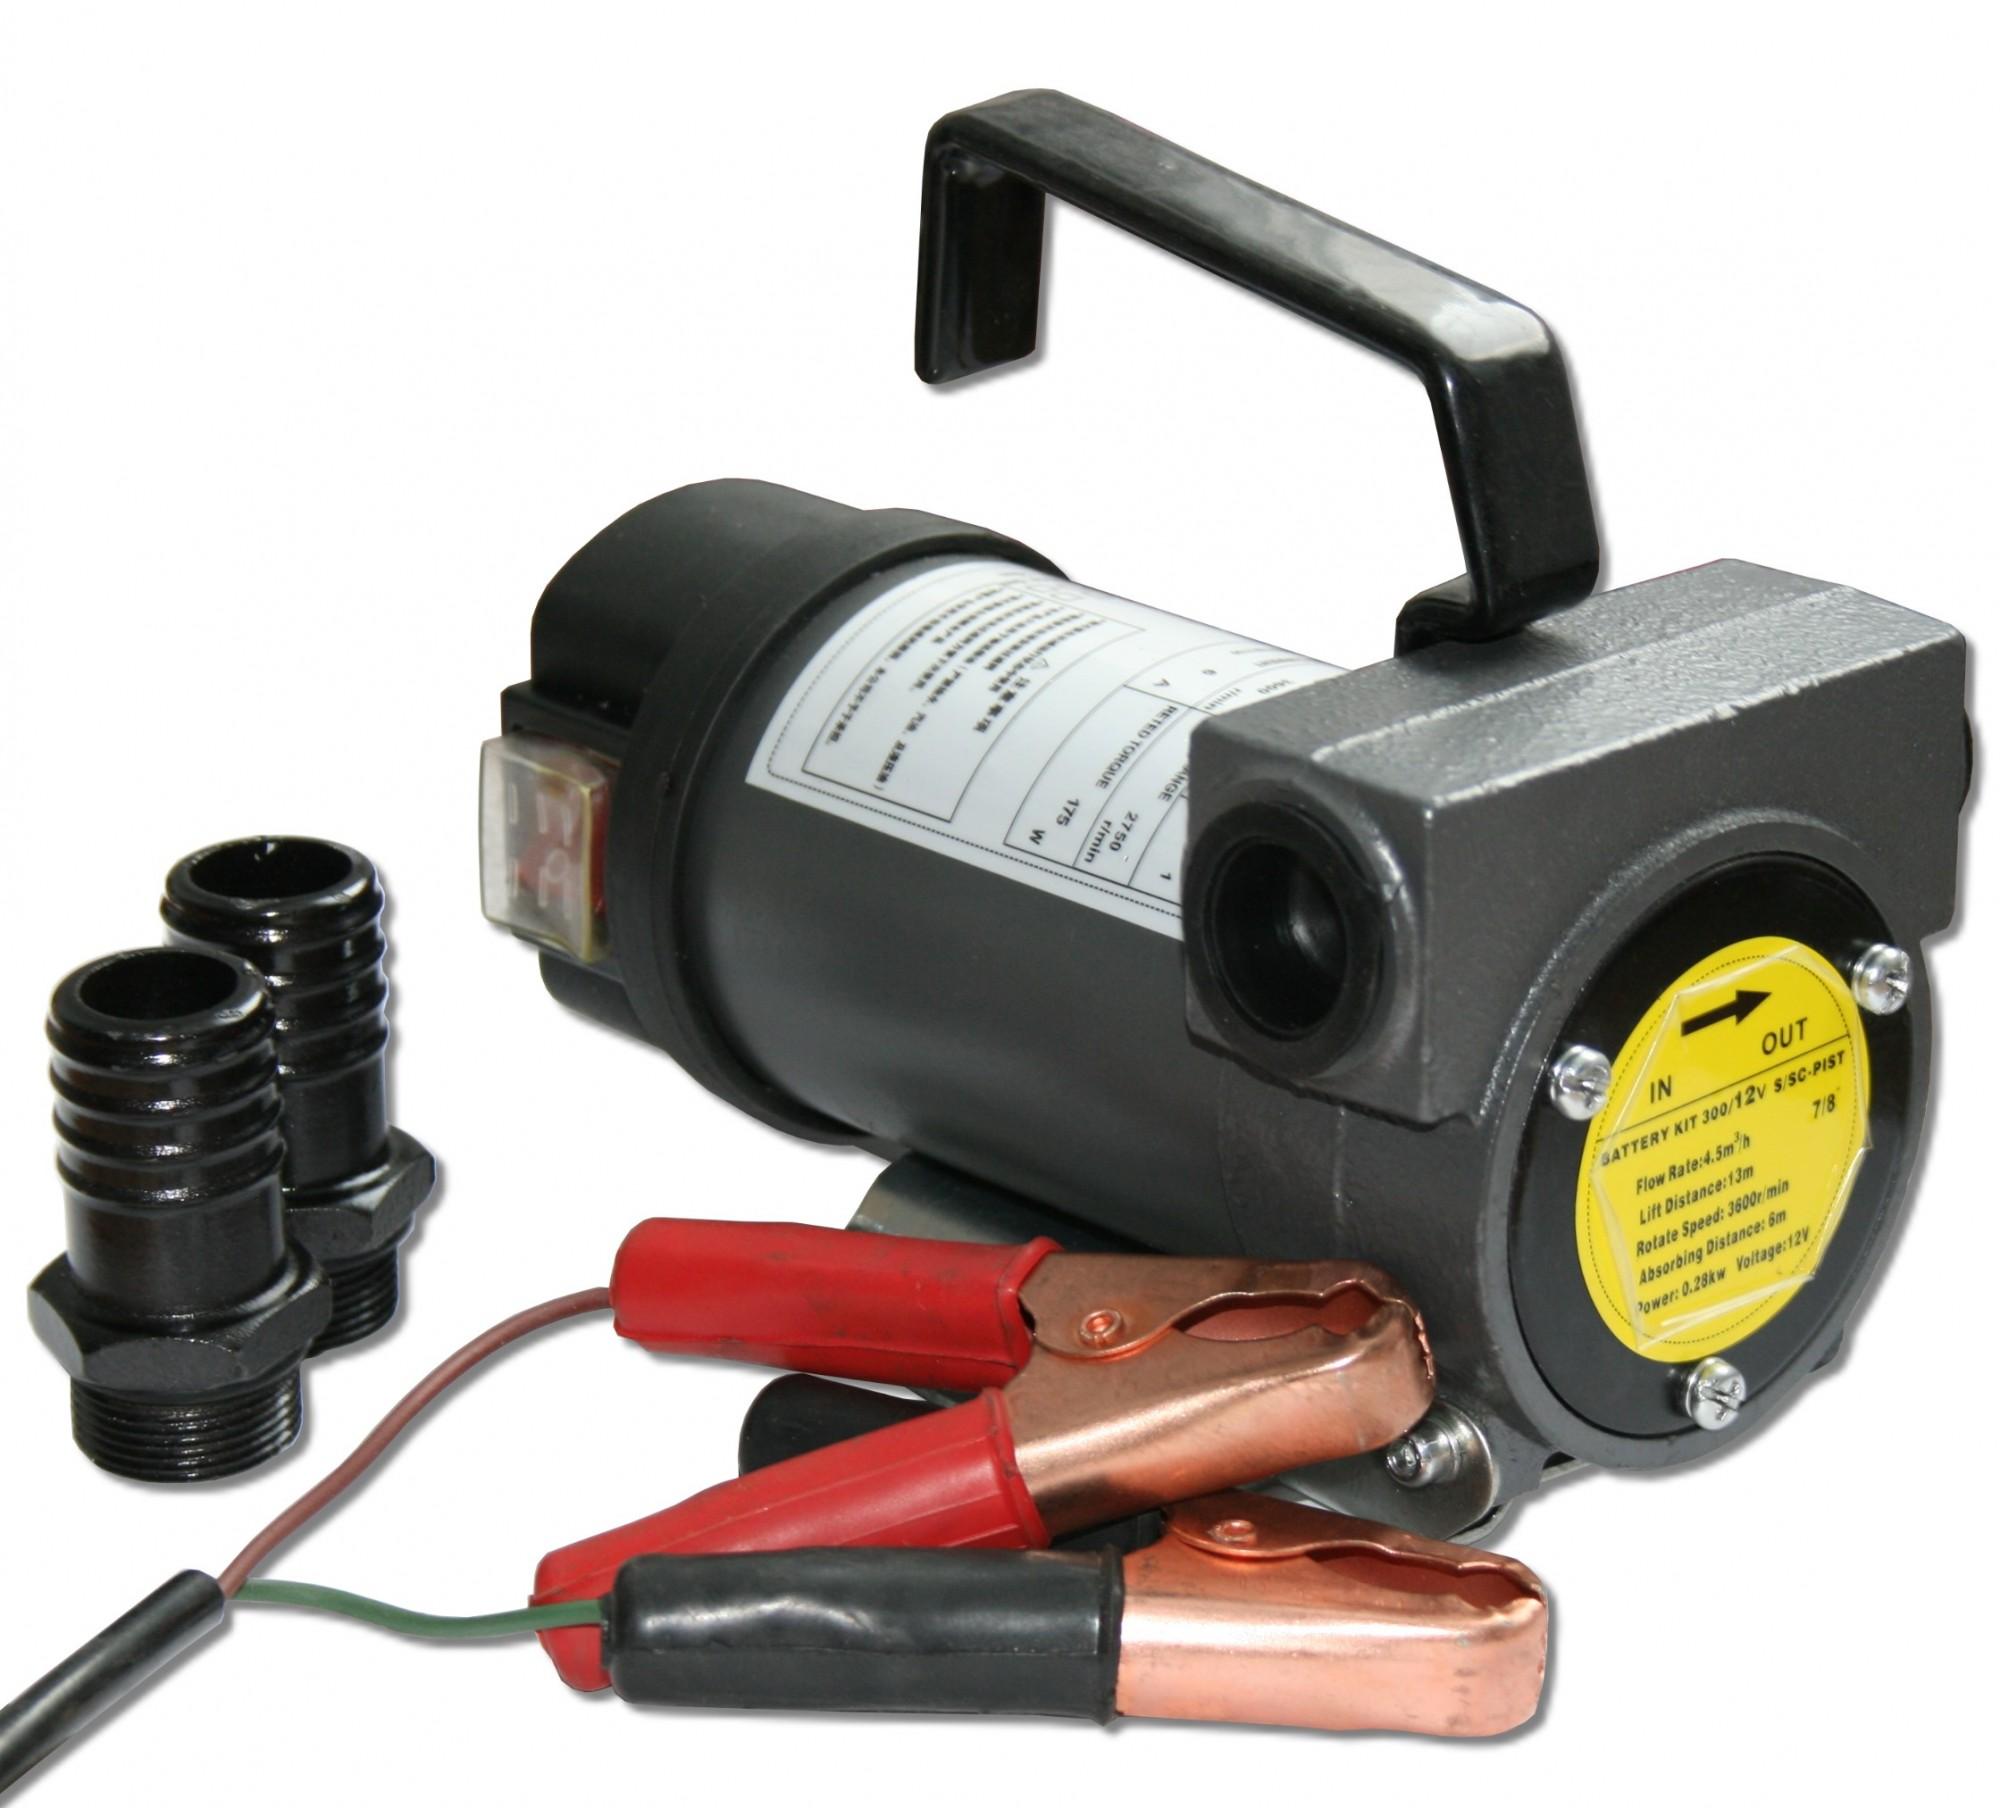 dieselpumpe heiz lpumpe selbstansaugend 12 volt 200watt 45liter min pumpen kraftstoffpumpe 12 volt. Black Bedroom Furniture Sets. Home Design Ideas